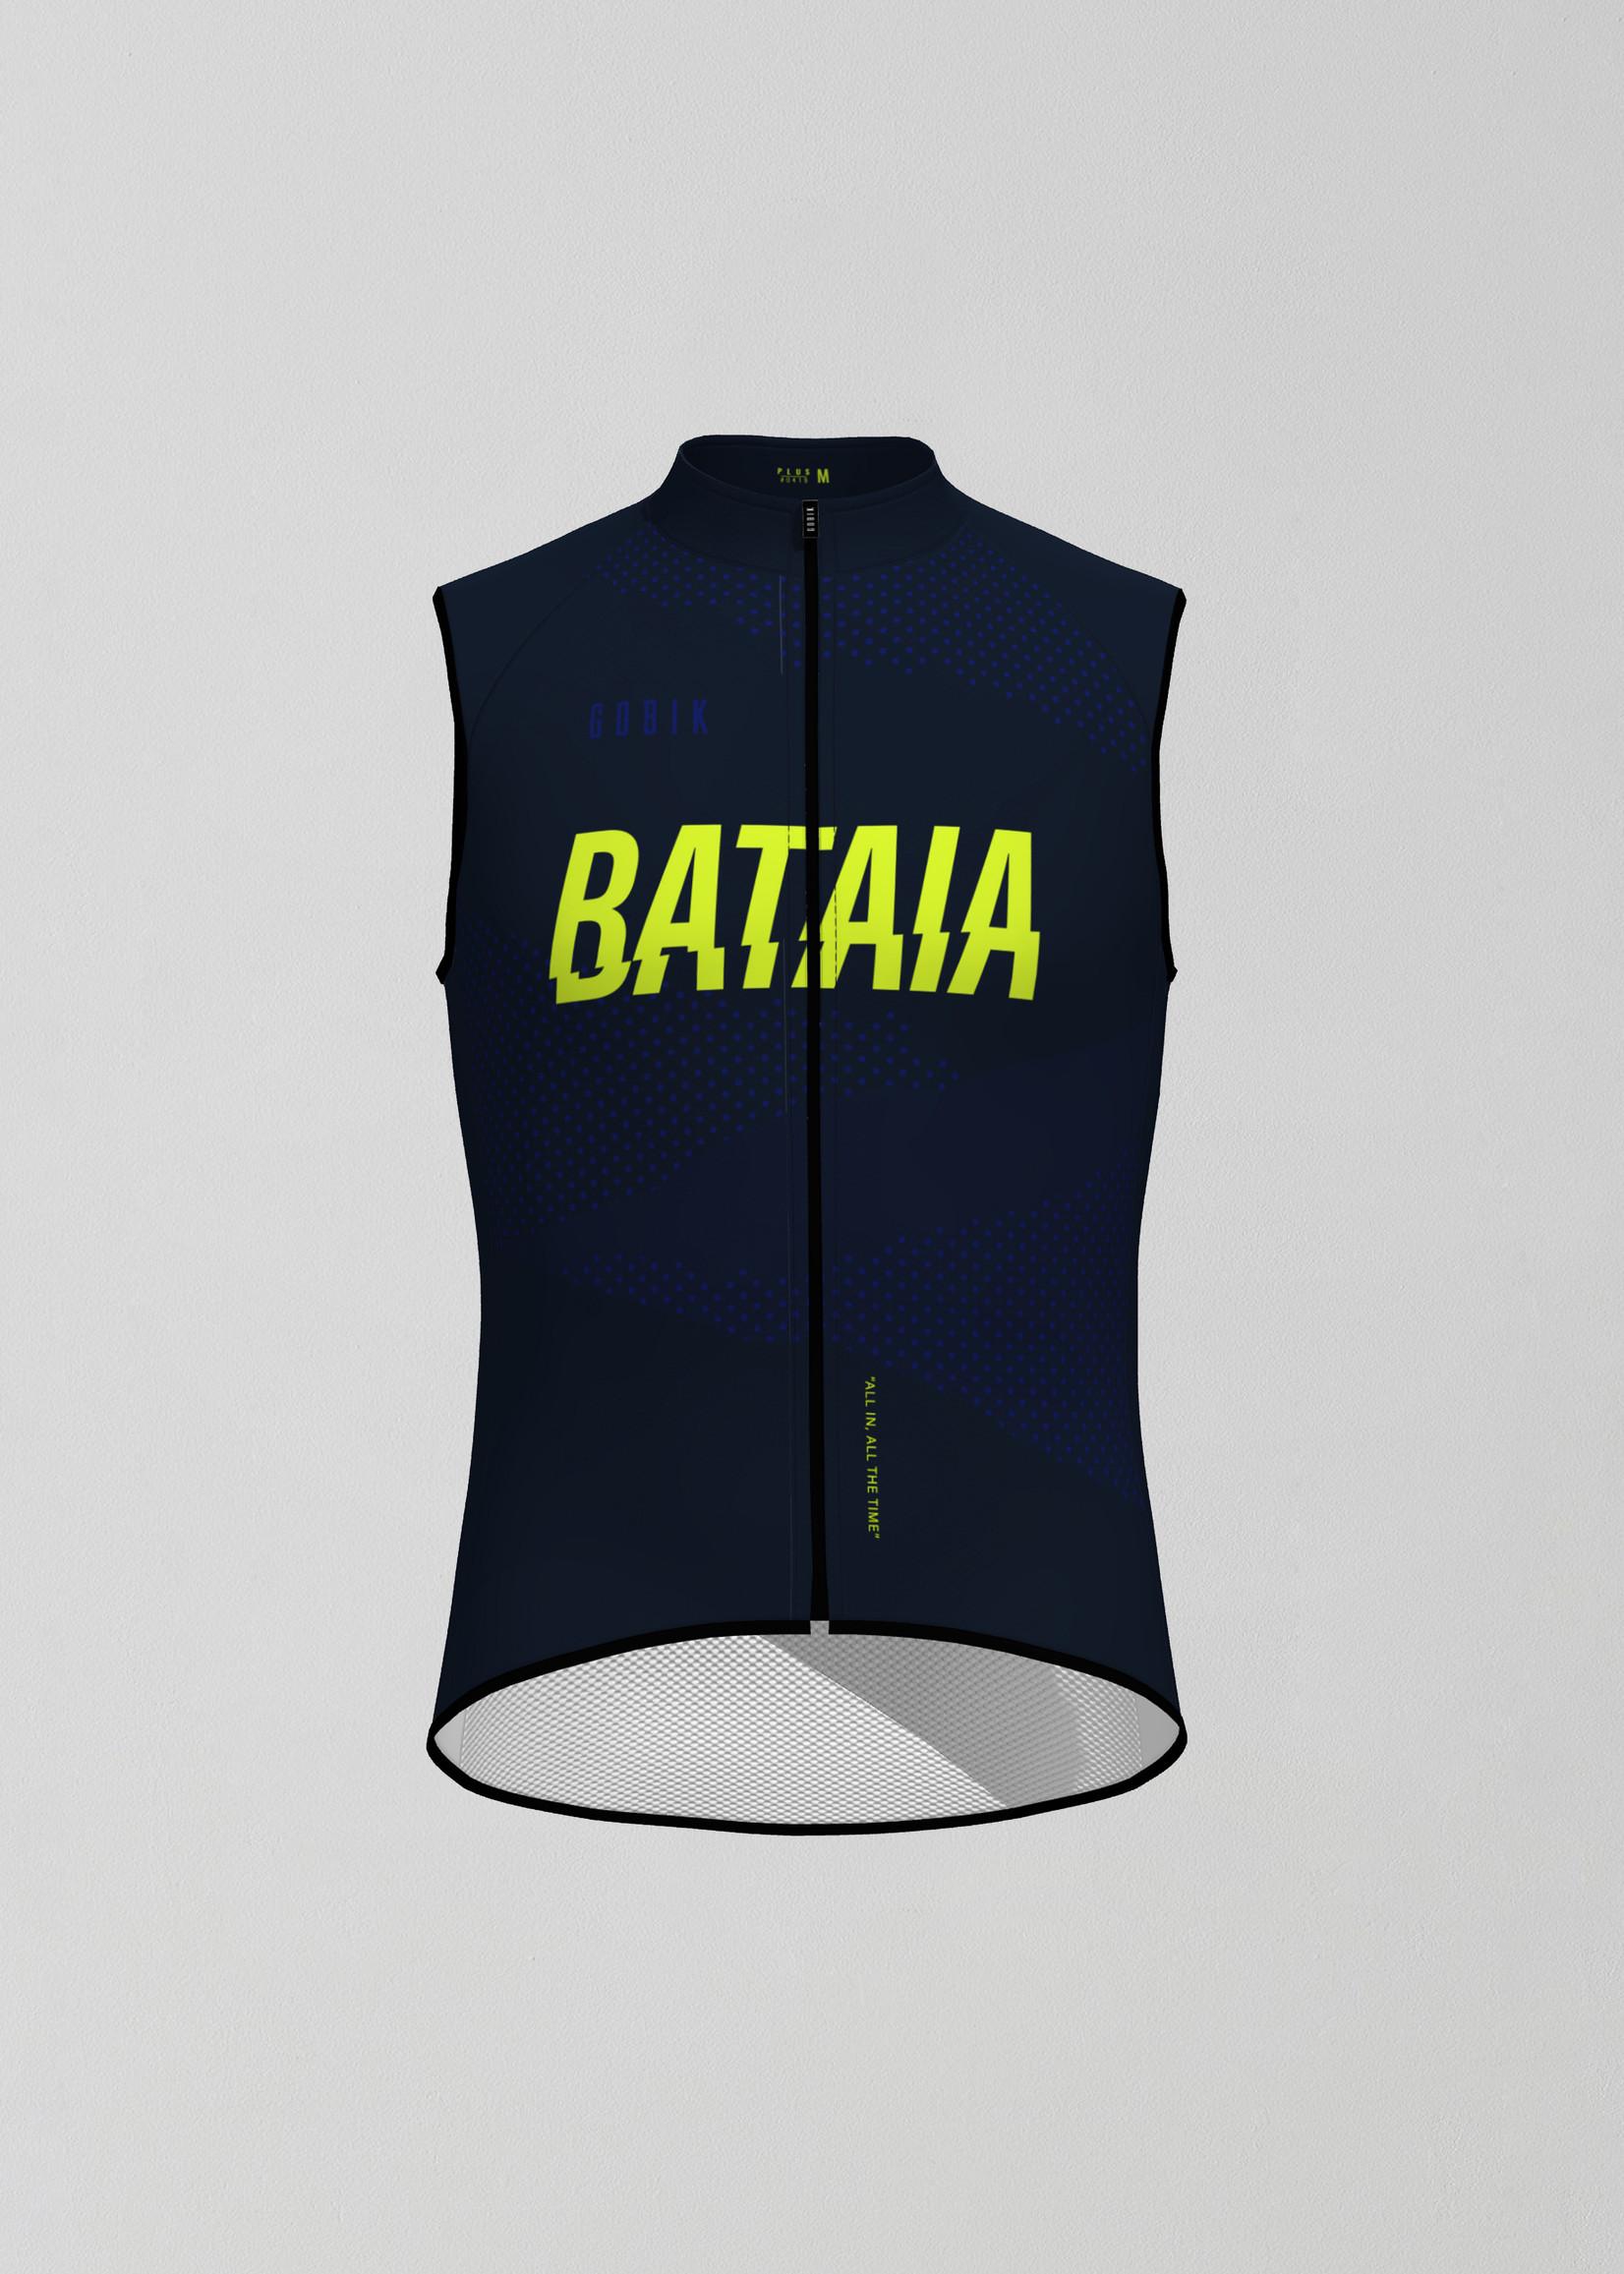 Bataia Team Windbreaker